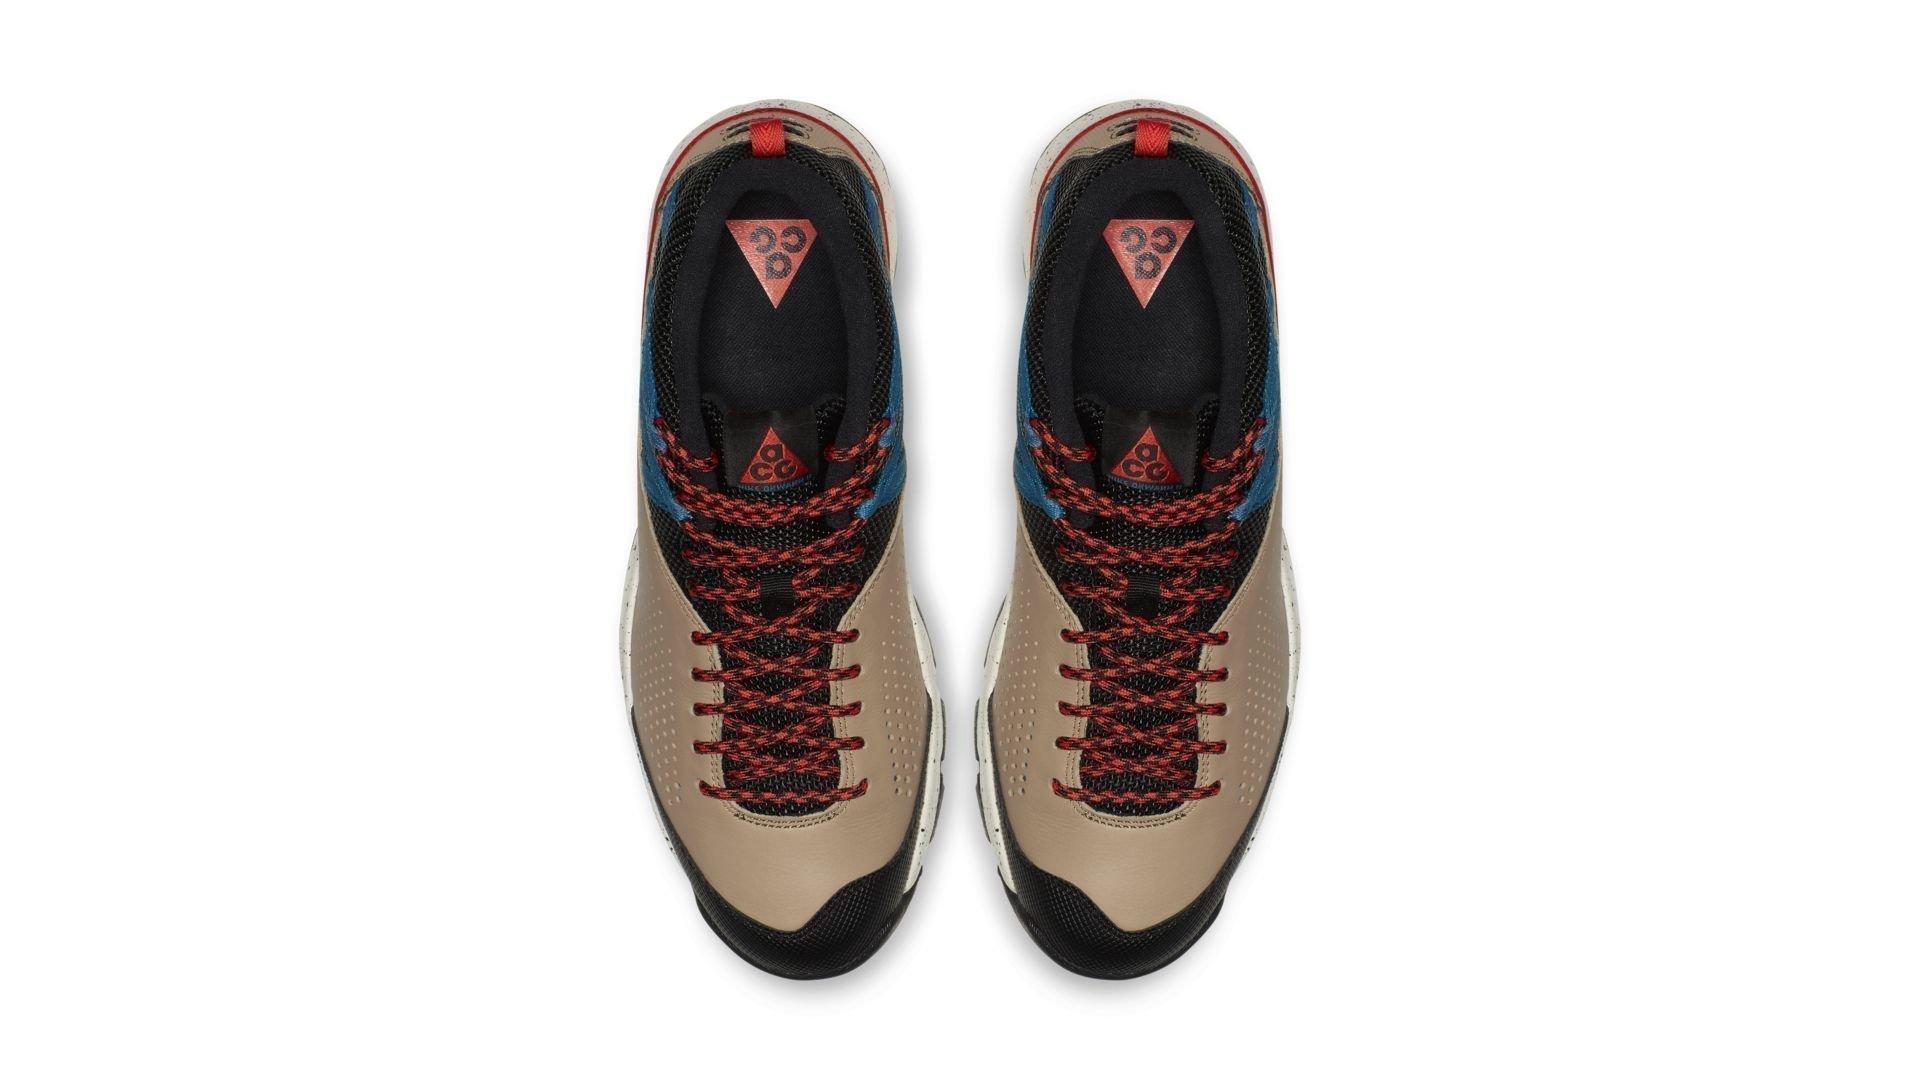 Nike Okwahn II 'Desert' (525367-200)